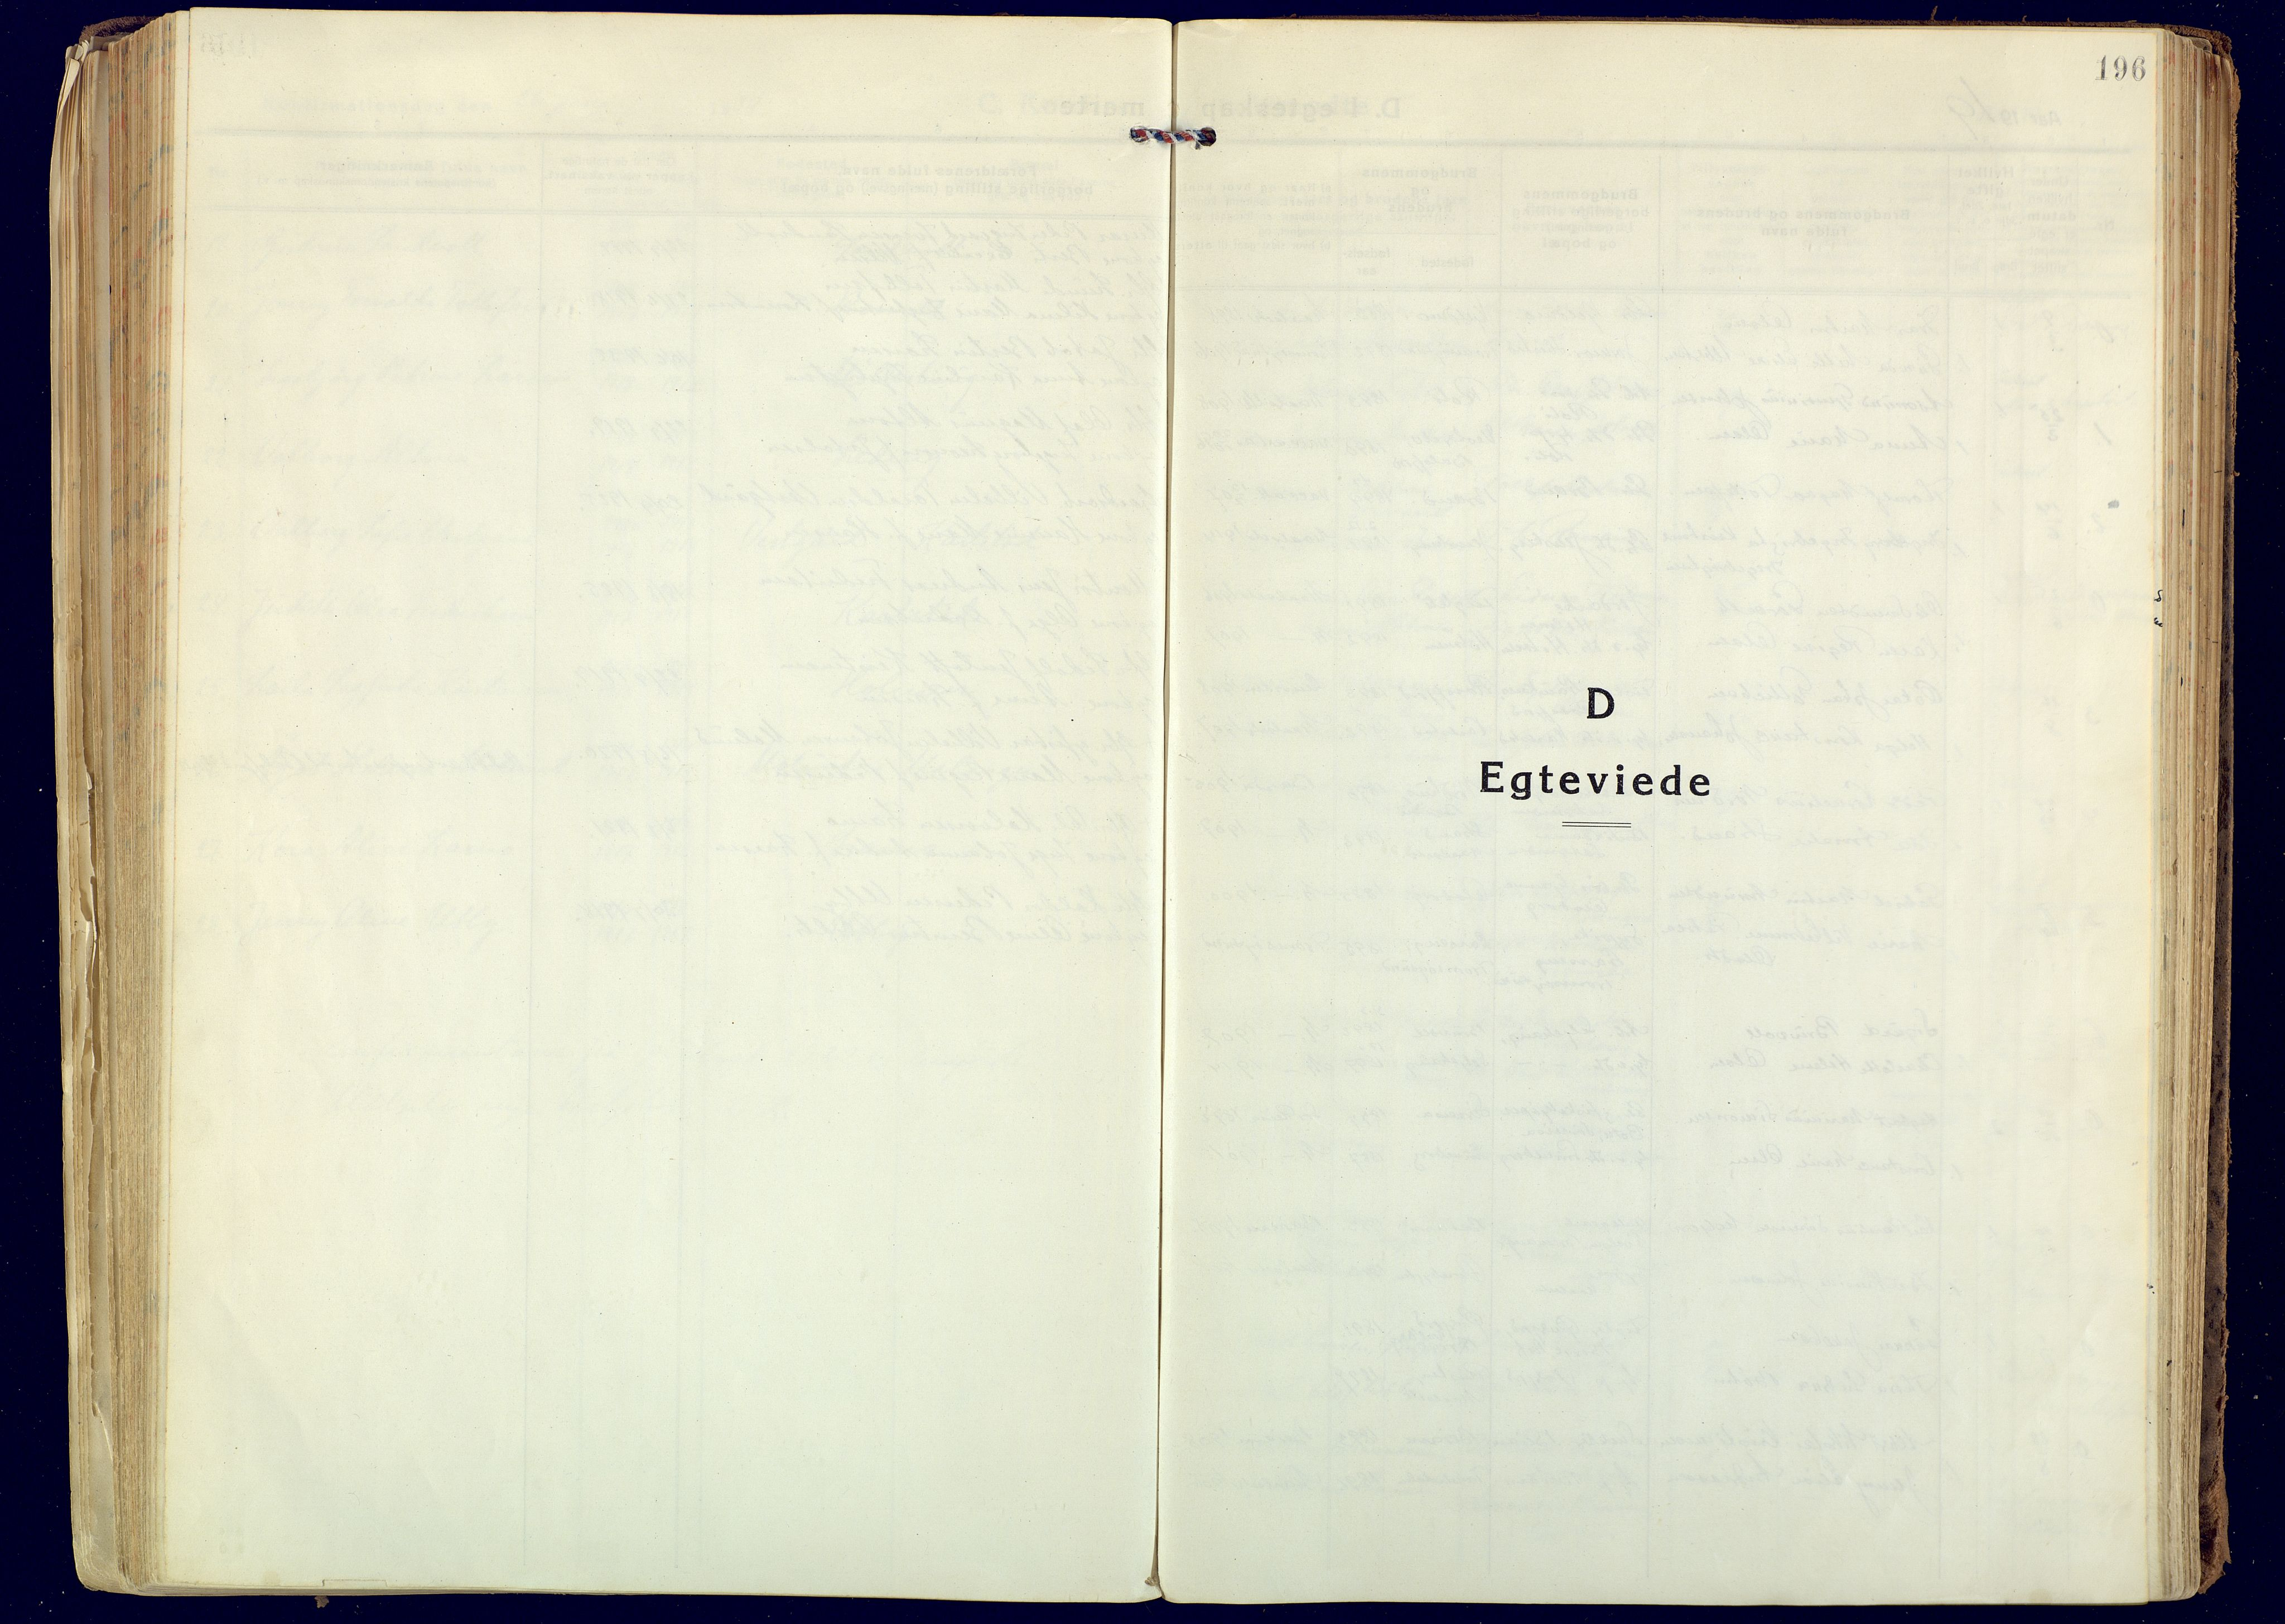 SATØ, Målselv sokneprestembete, Ministerialbok nr. 14, 1919-1932, s. 196